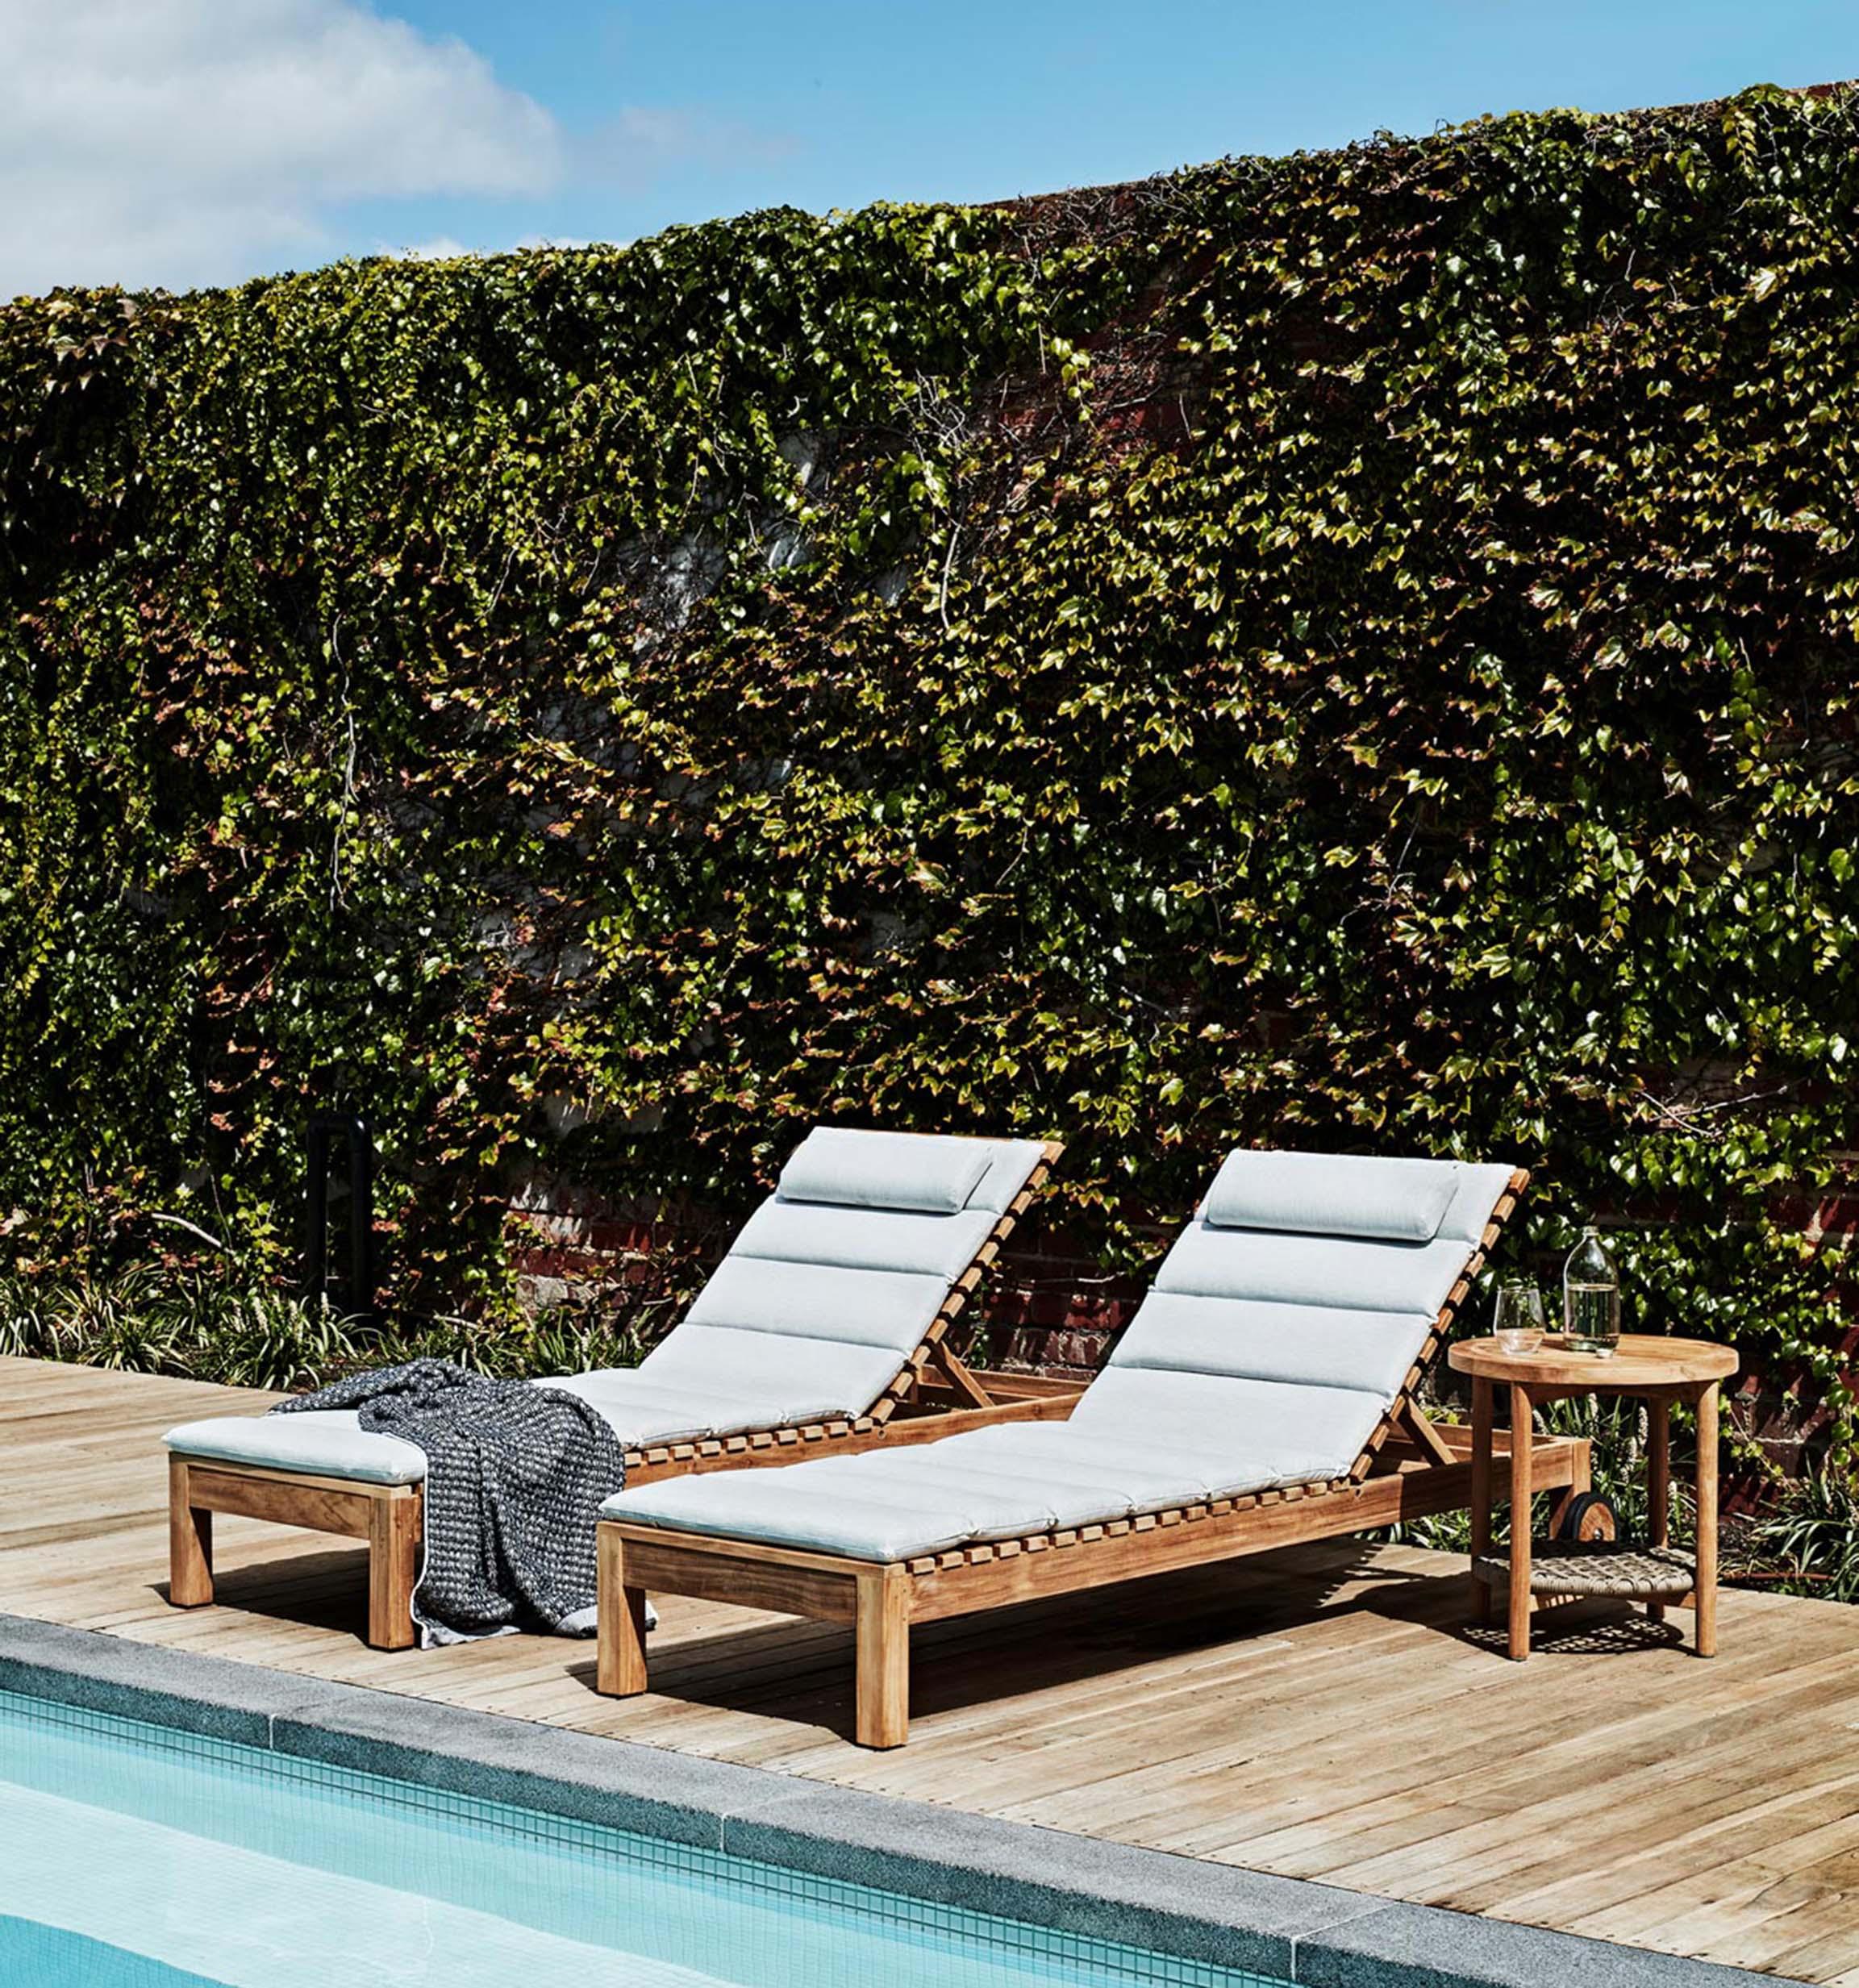 Furniture menu-images sunbeds-and-daybeds